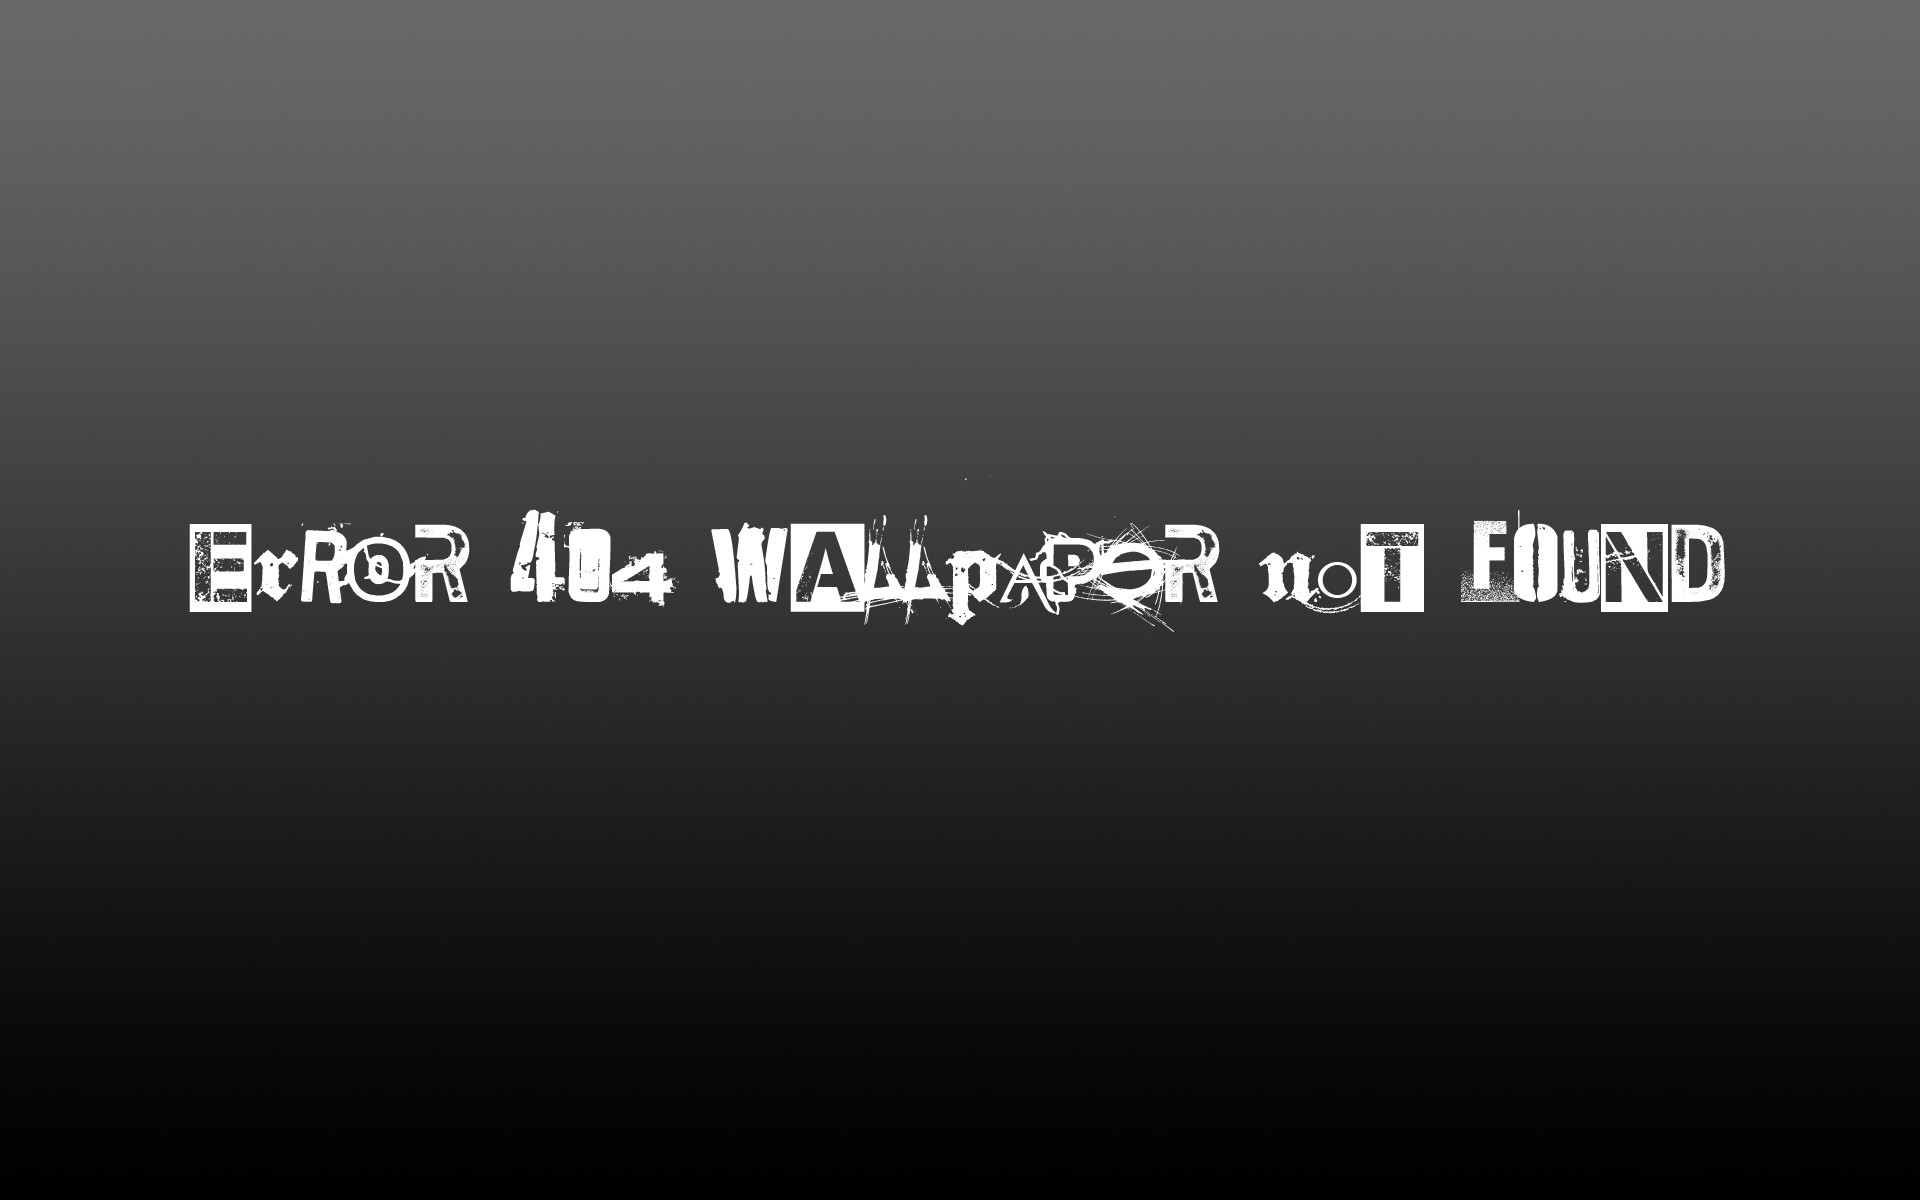 error typography 404 photo manipulation free wallpaper